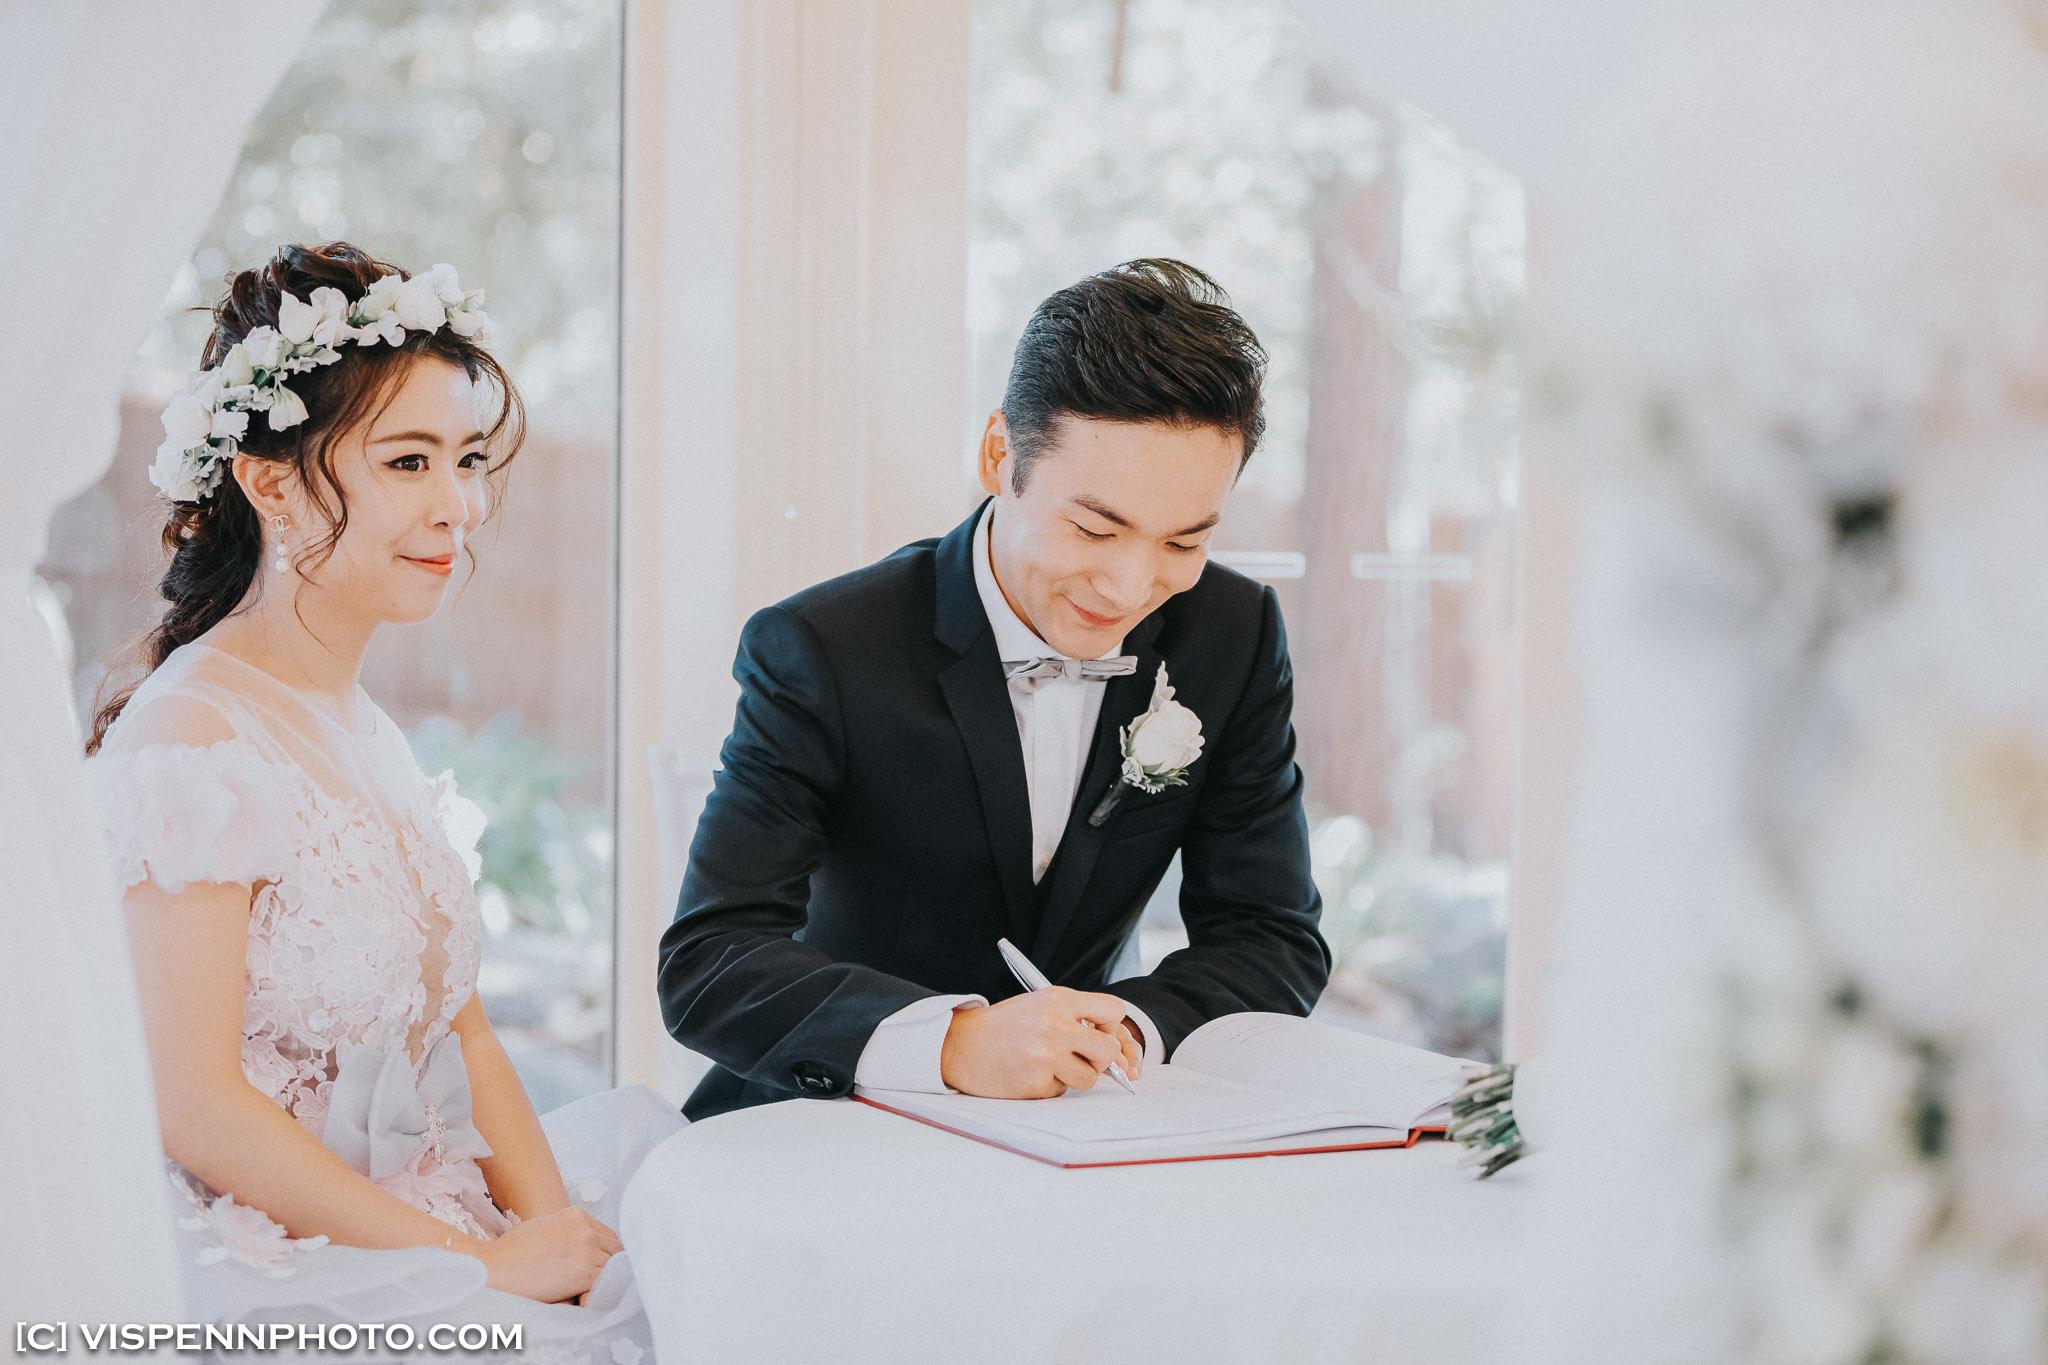 WEDDING DAY Photography Melbourne ZHPENN H4 0466